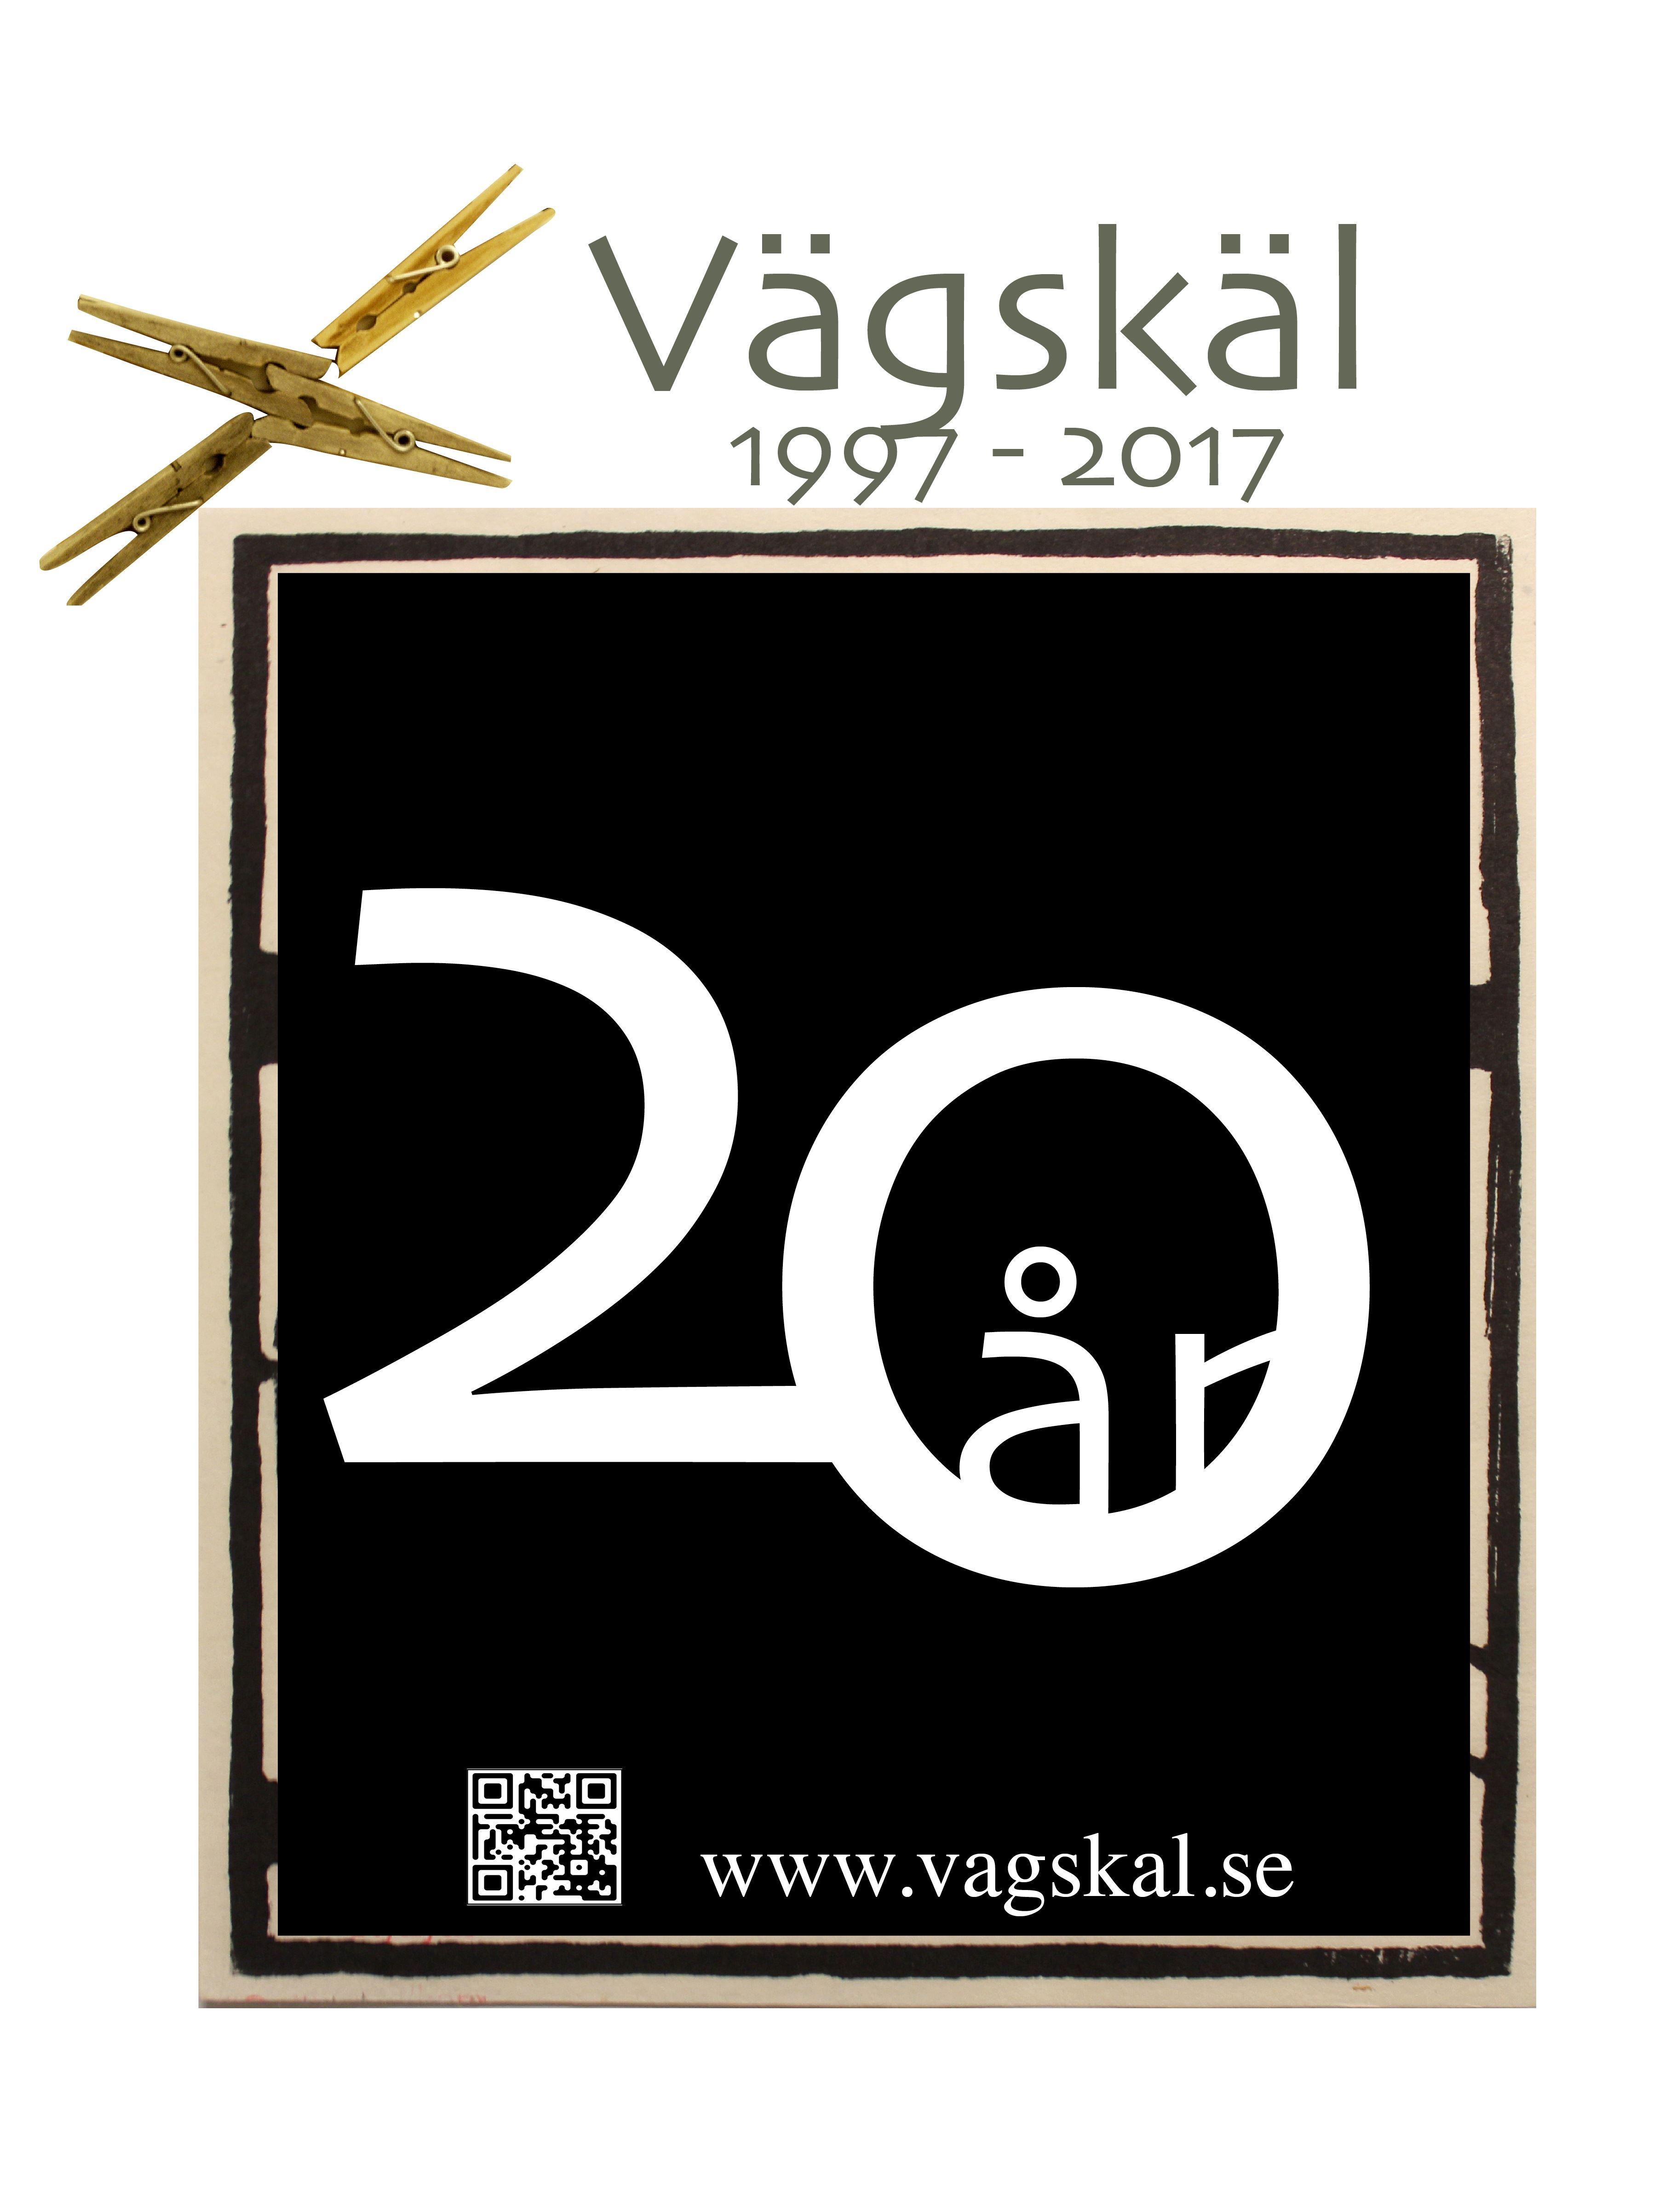 Vägskäl-Leksands Kulturhus